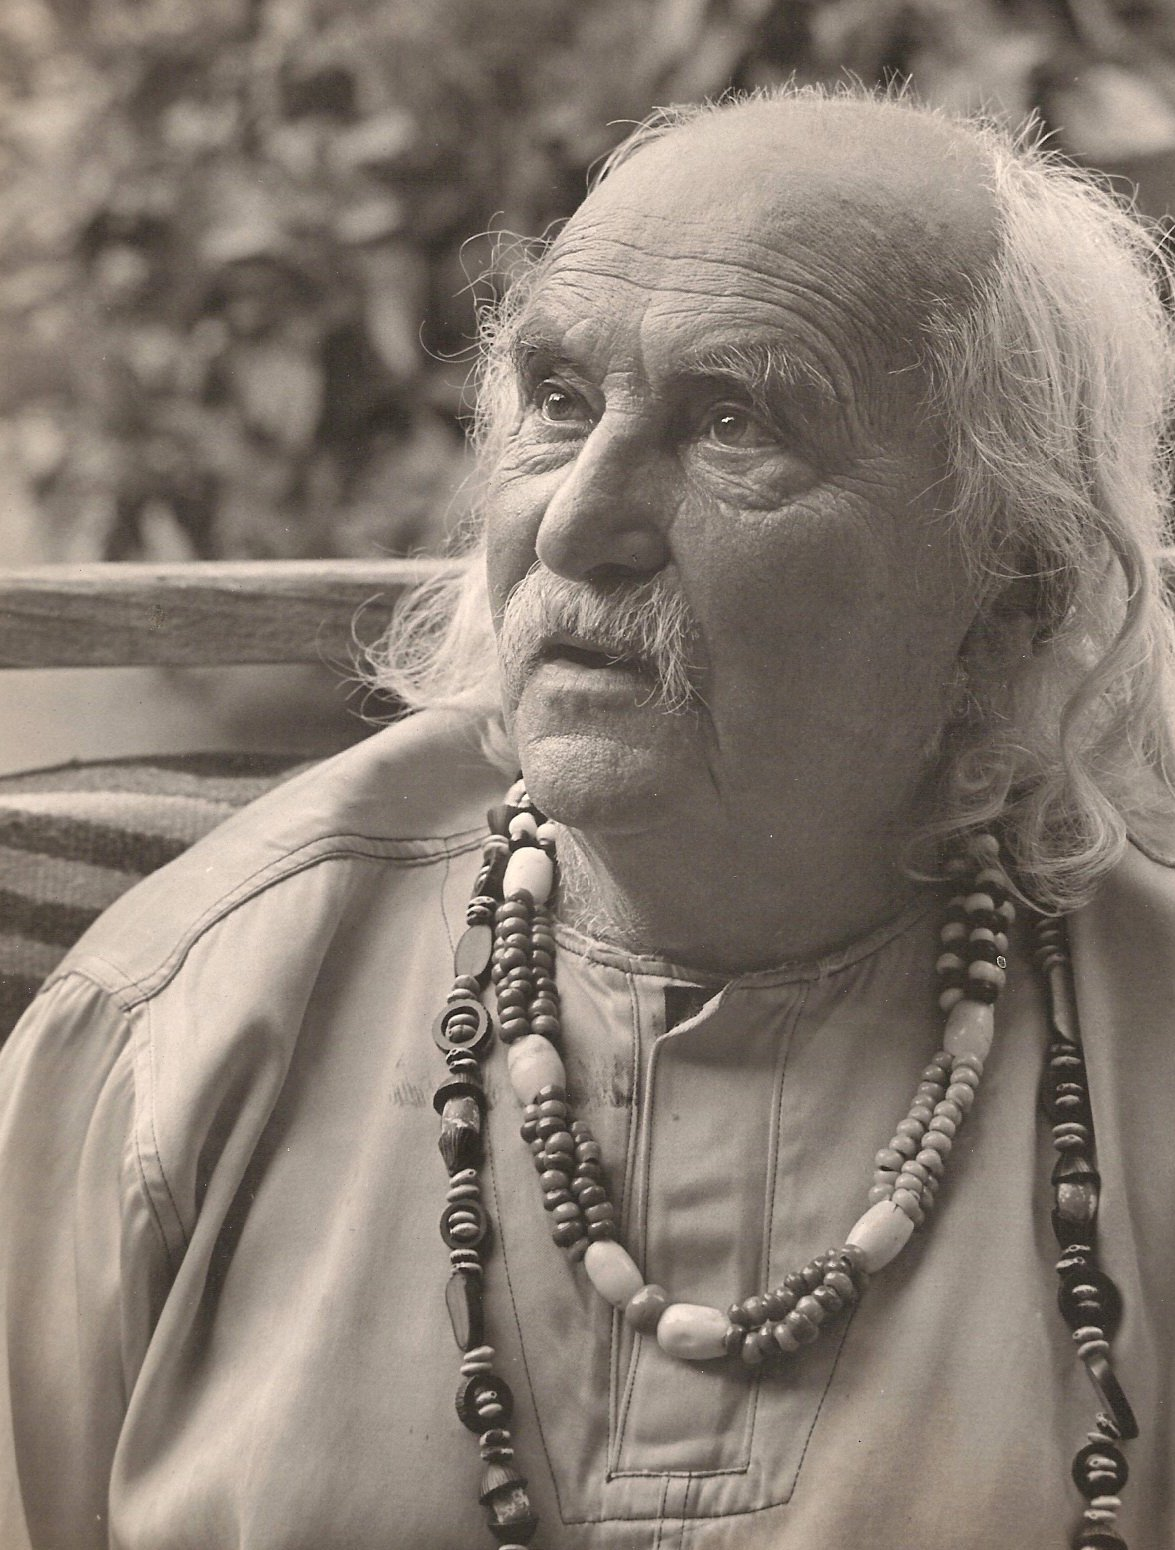 Jean Varda near the end of his life. Photo courtesy of Sausalito Historical Society